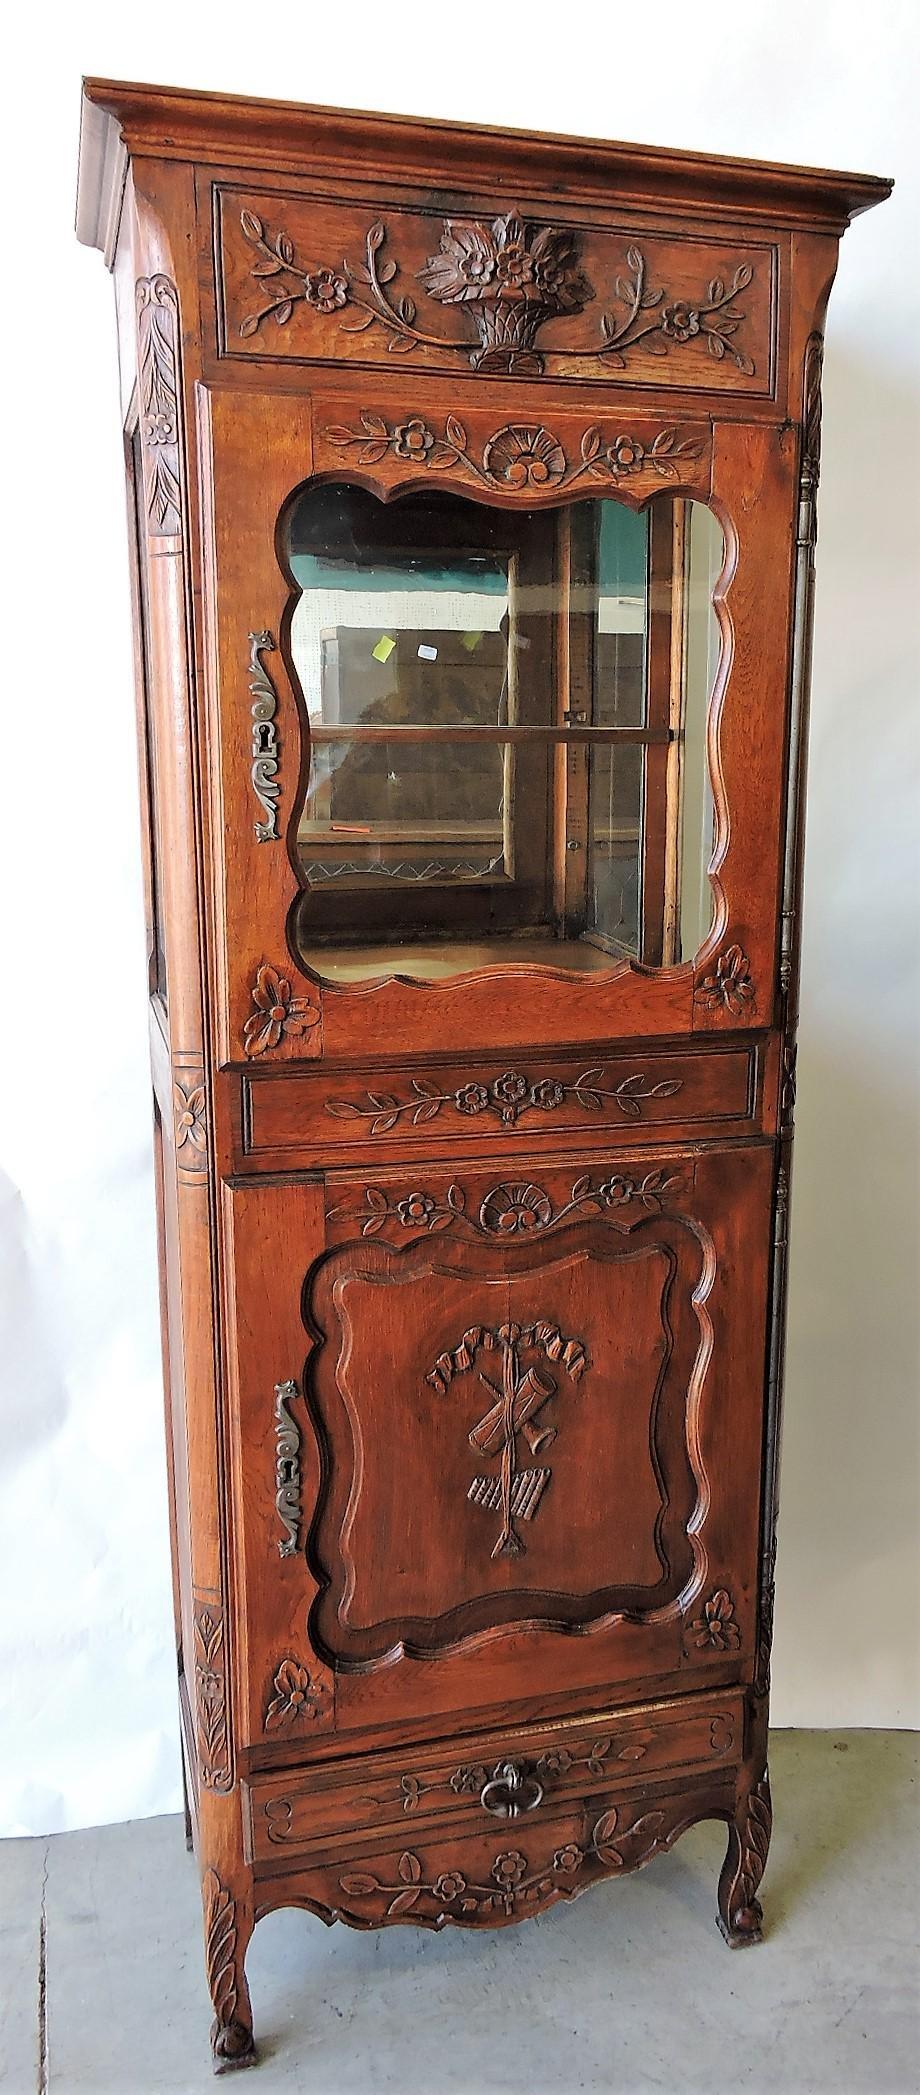 Oak carved display case with carved